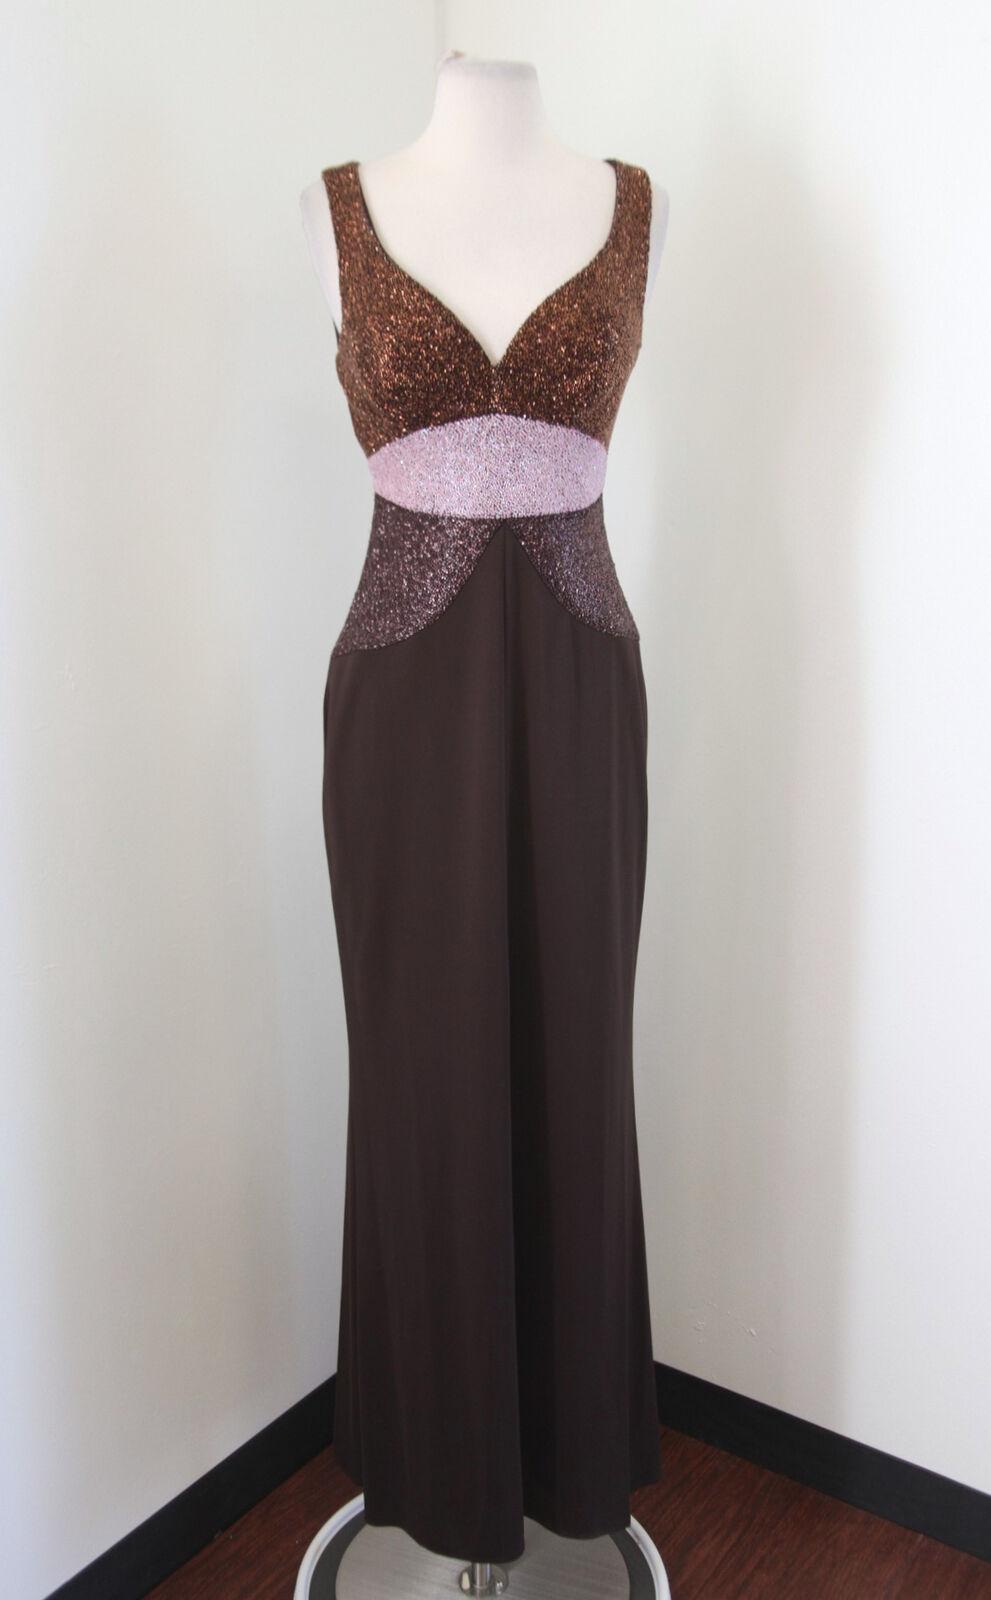 braun Sequin Beaded Evening Dress Formal Gown Größe 4 Bronze Rosa Prom Sweetheart